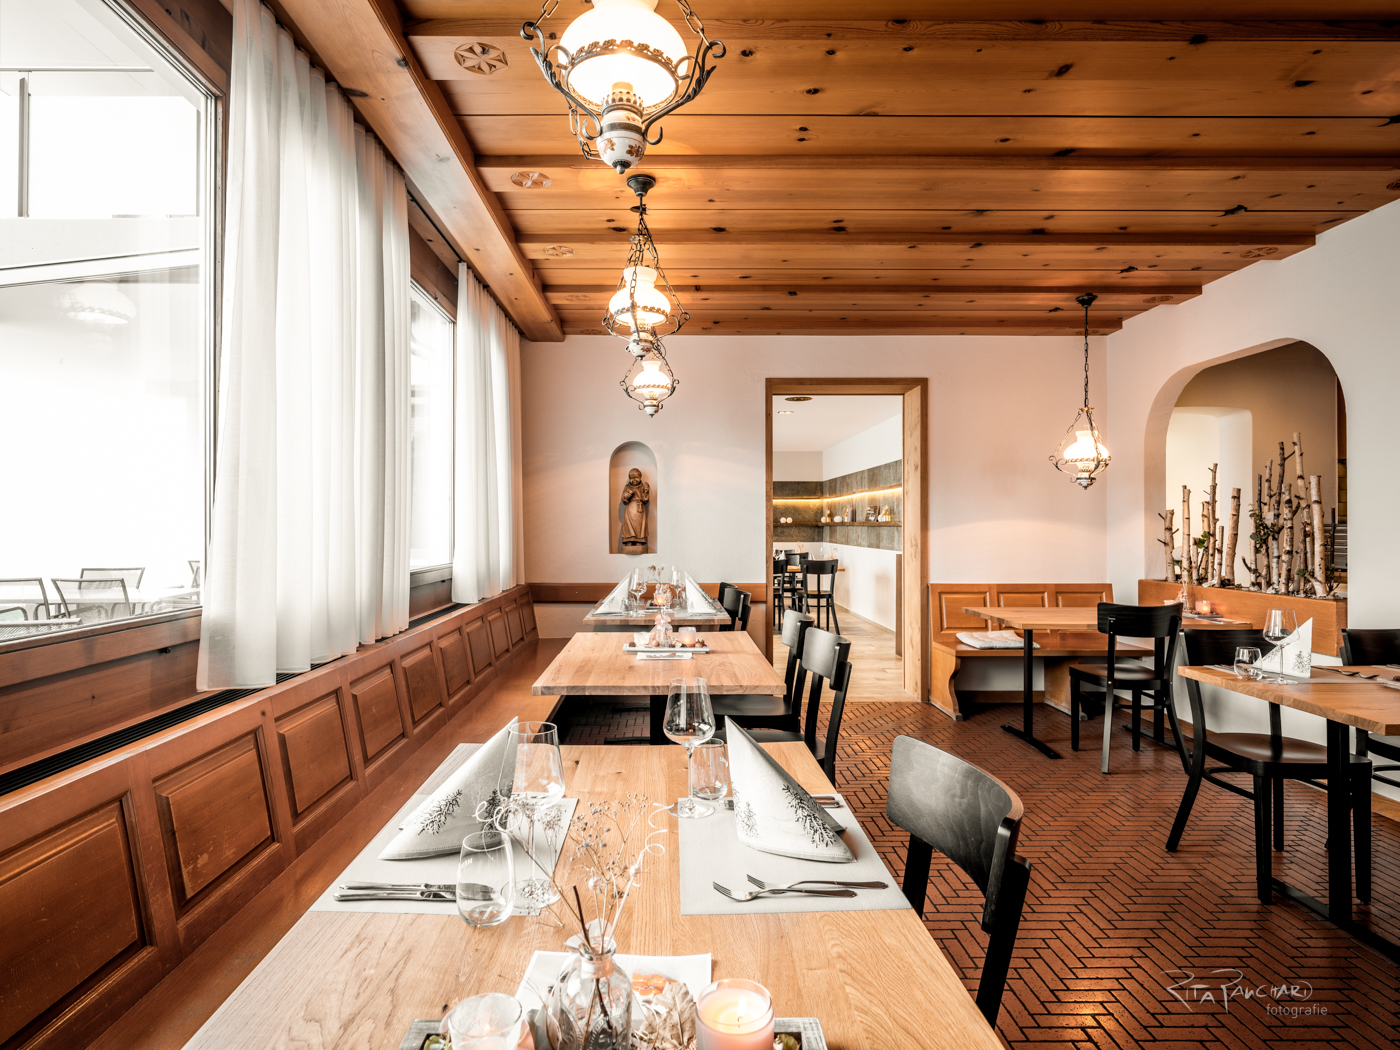 restaurantfotografie_gastrofotografie-5075.jpg